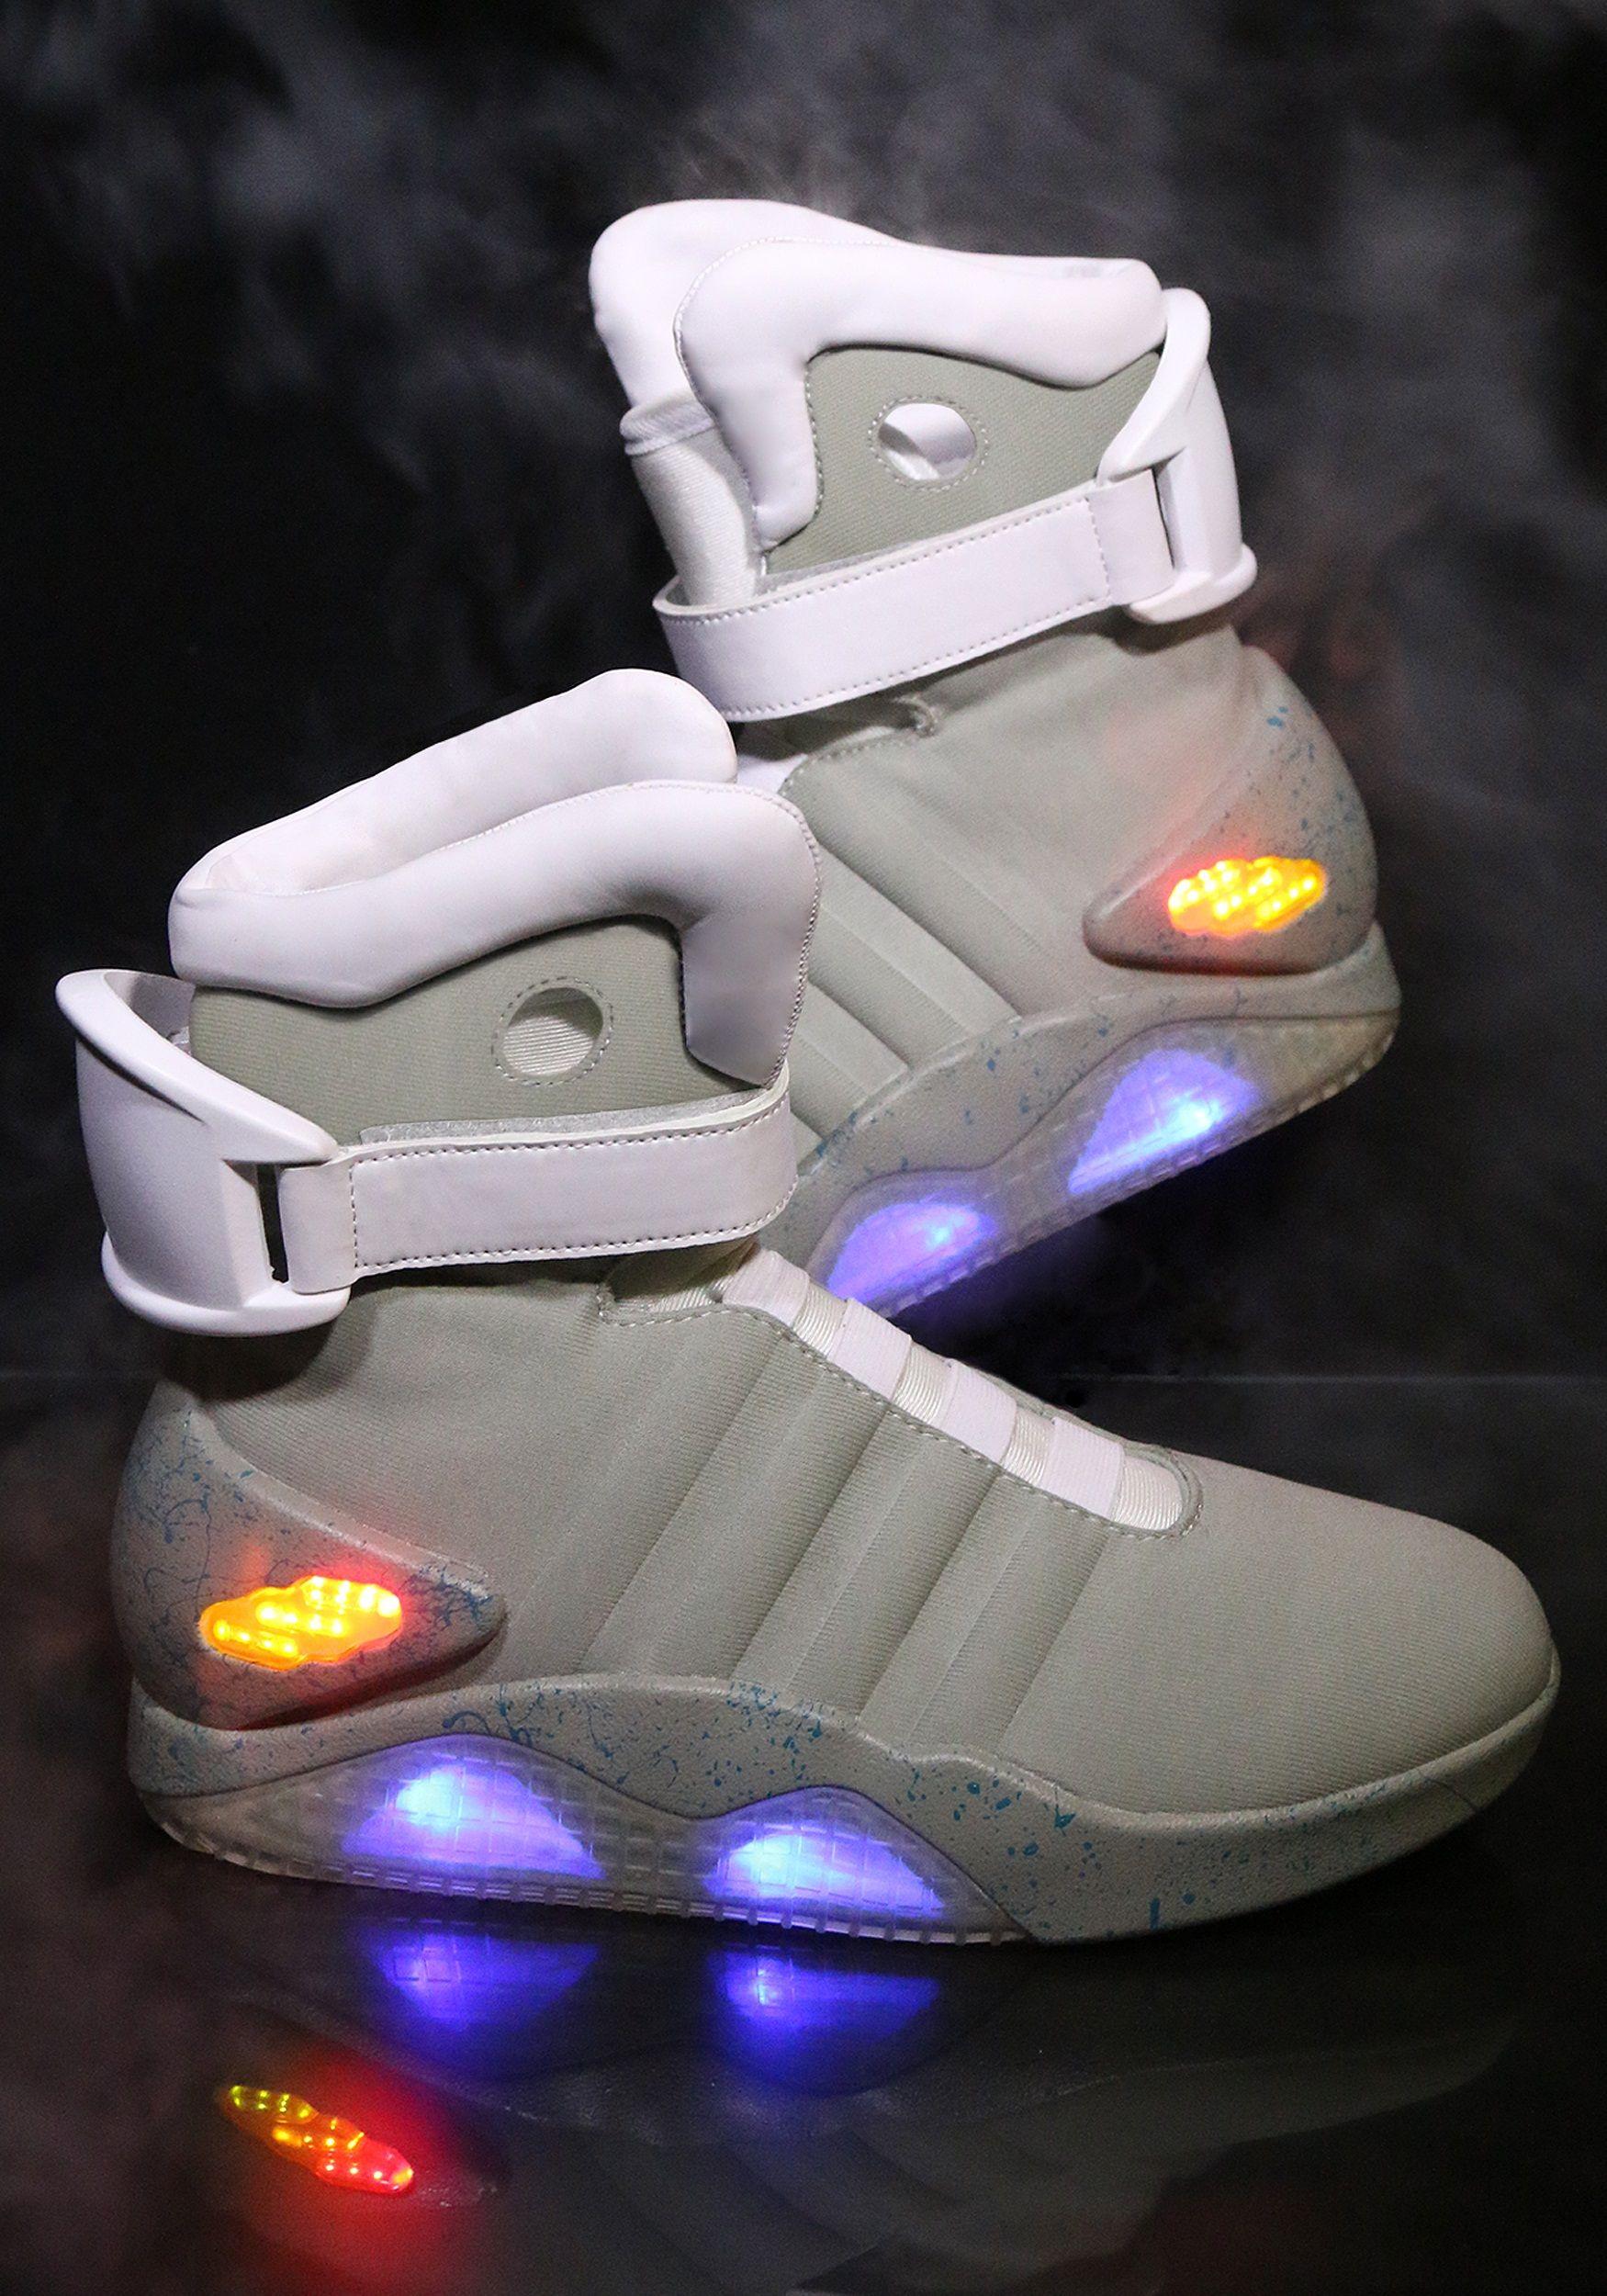 2014 nike hyperfuse nike halloween shoes